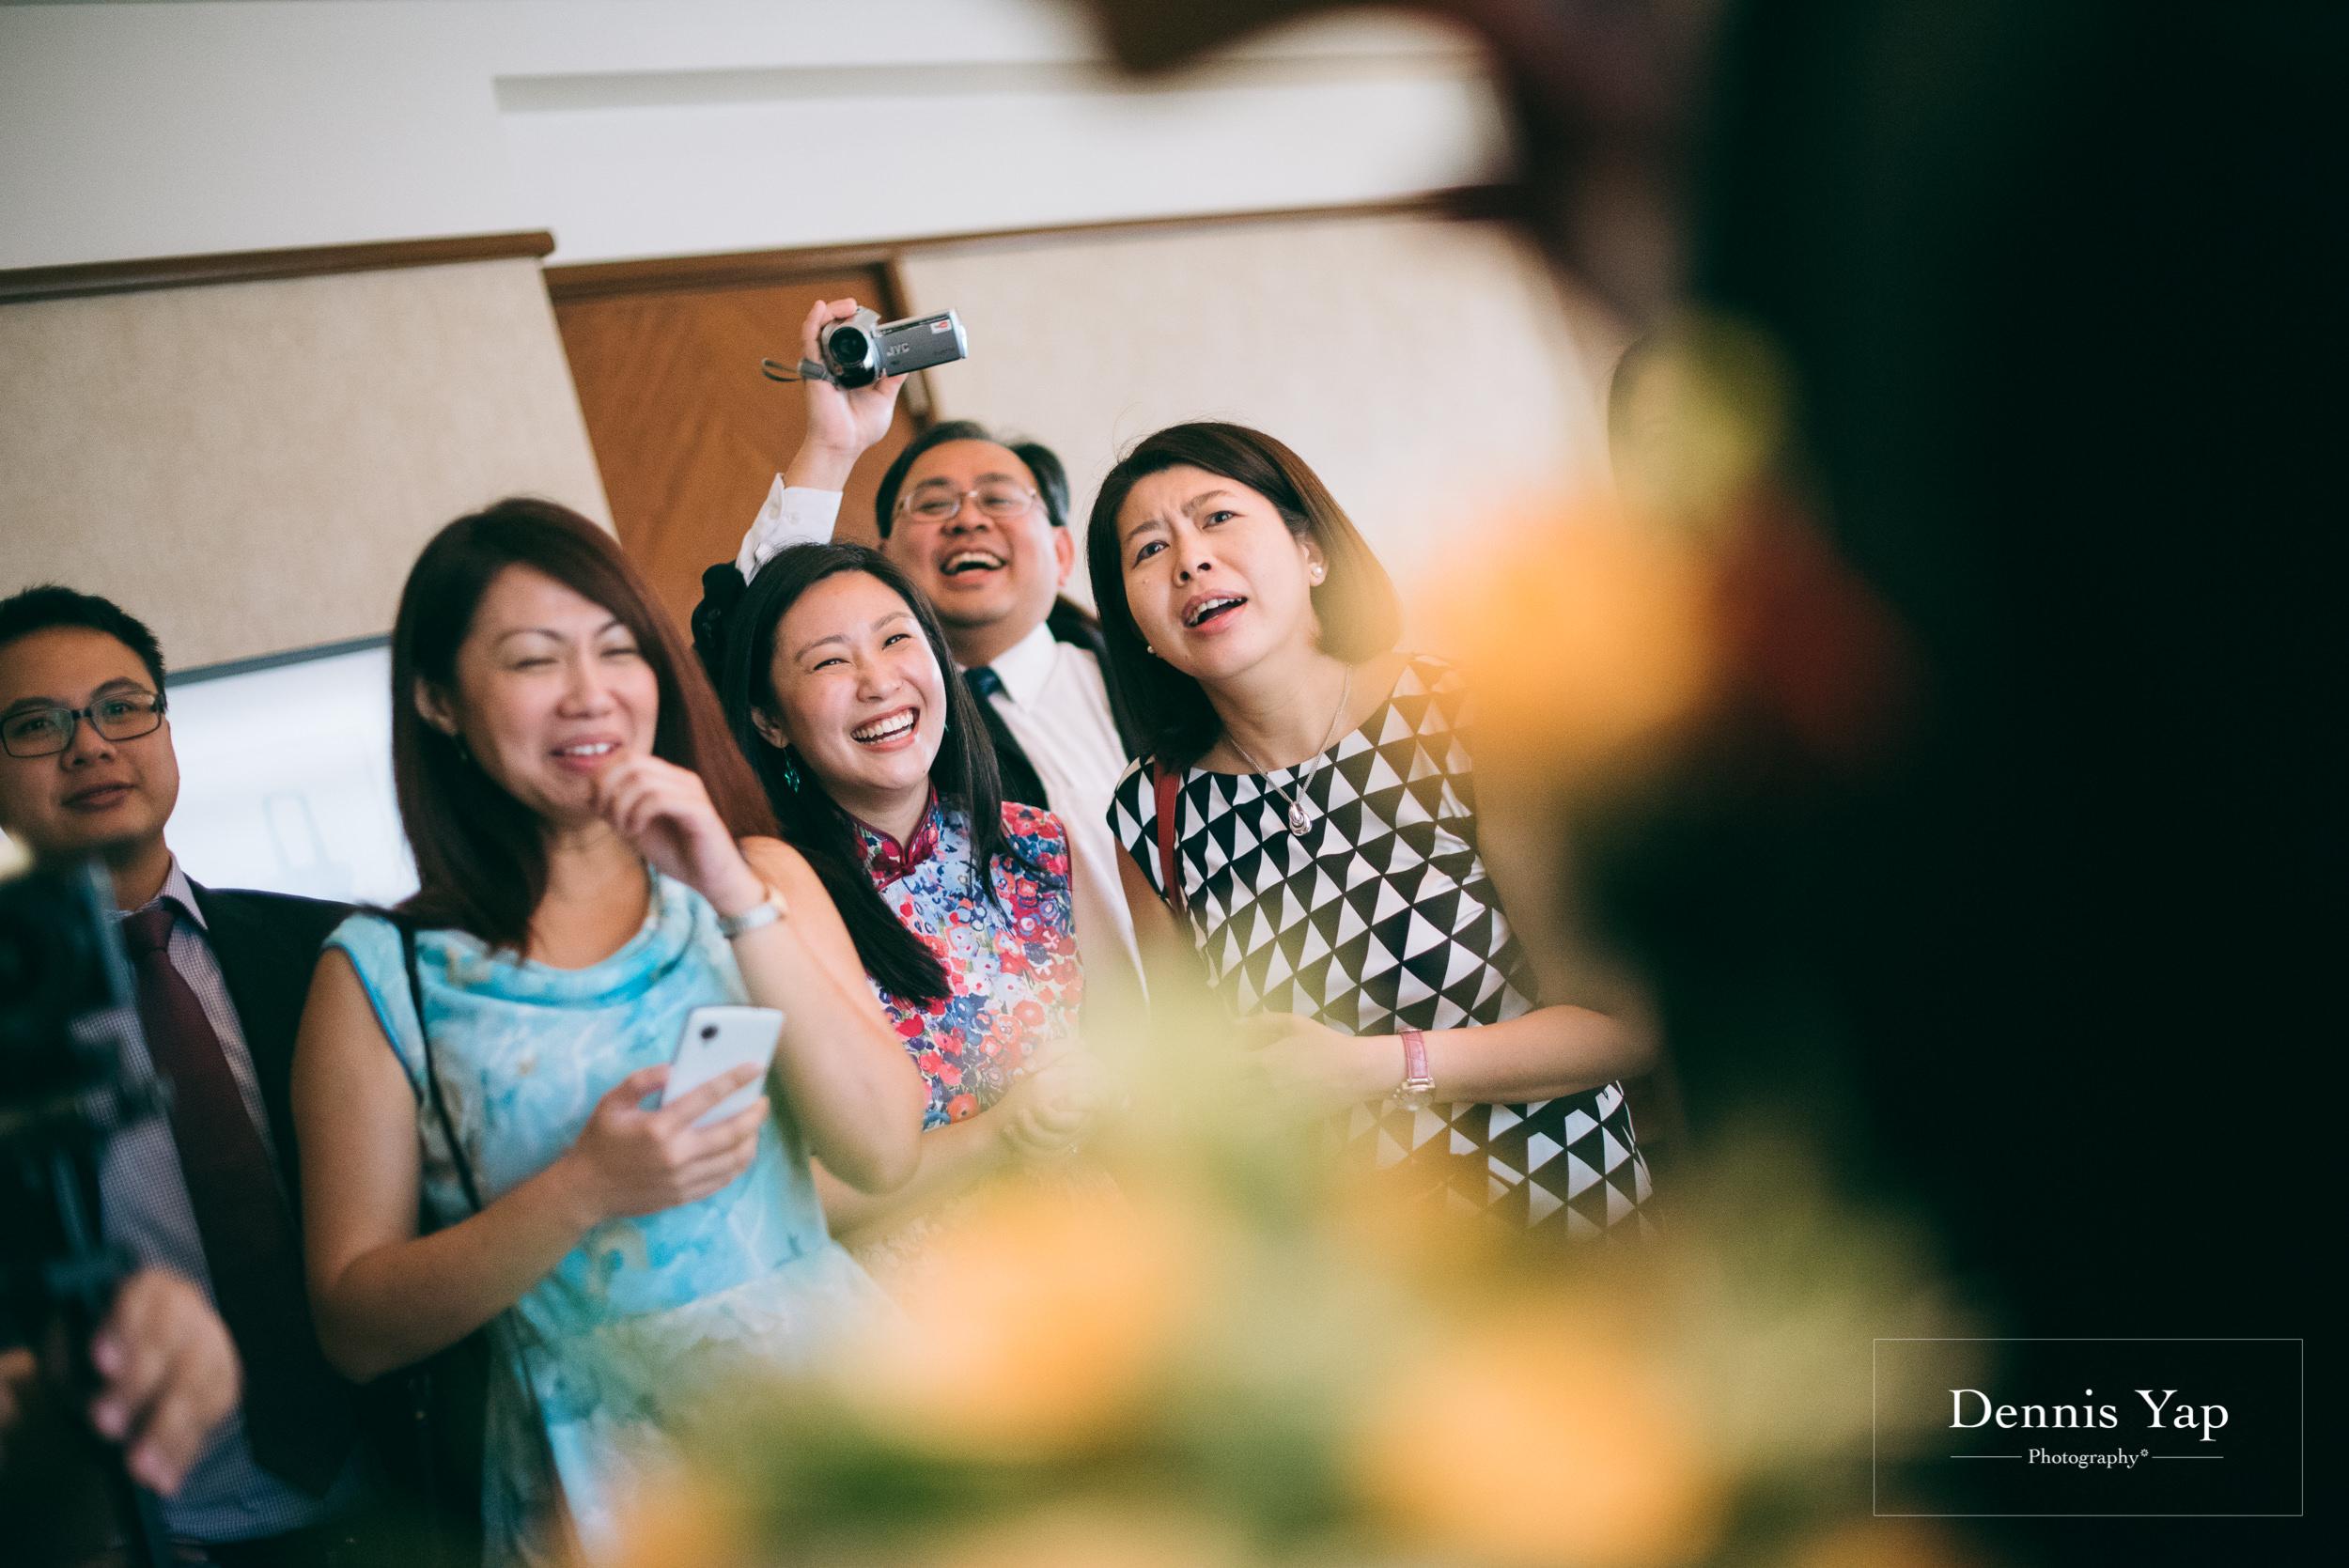 wai keong jenny wedding day bangsar dennis yap photography emotions beloved family-11.jpg